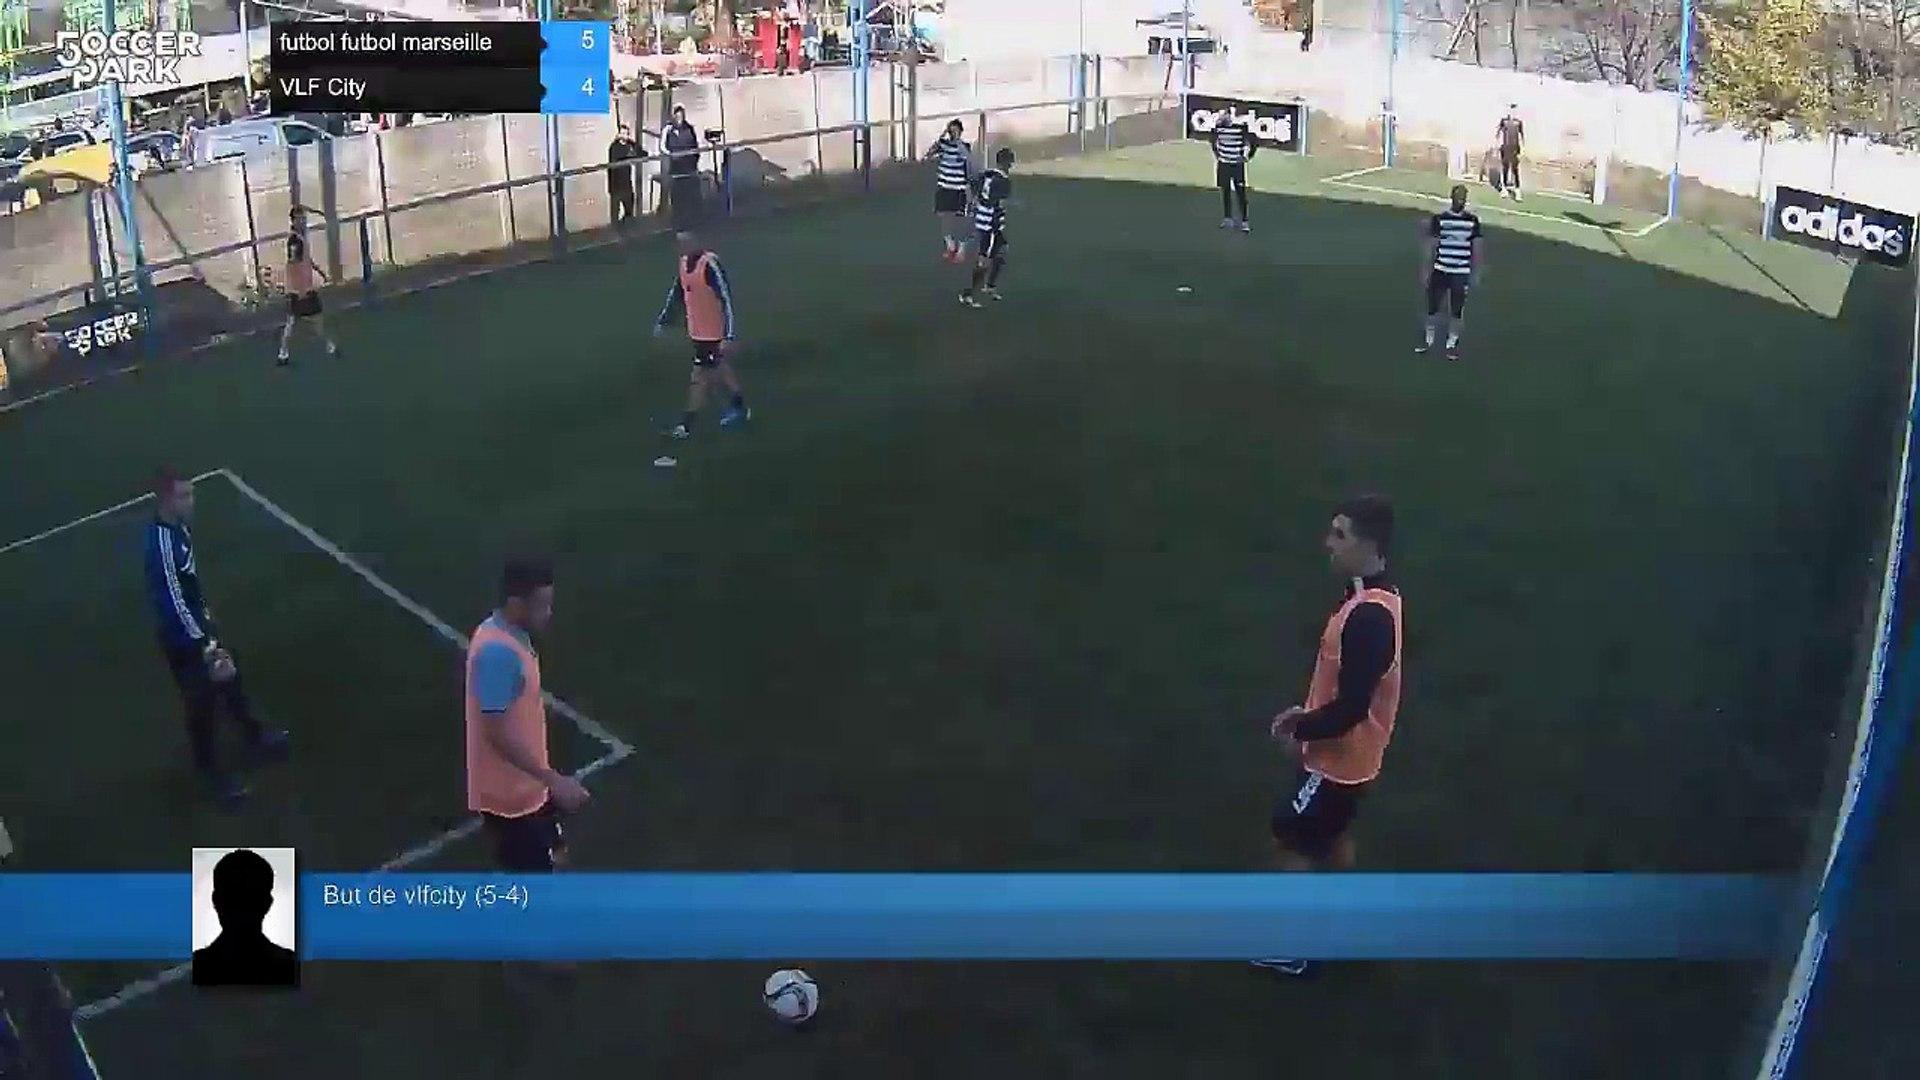 But de vlfcity (5-4) - futbol futbol marseille Vs VLF City - 12/12/15 11:22 - F5WC Finale regionale